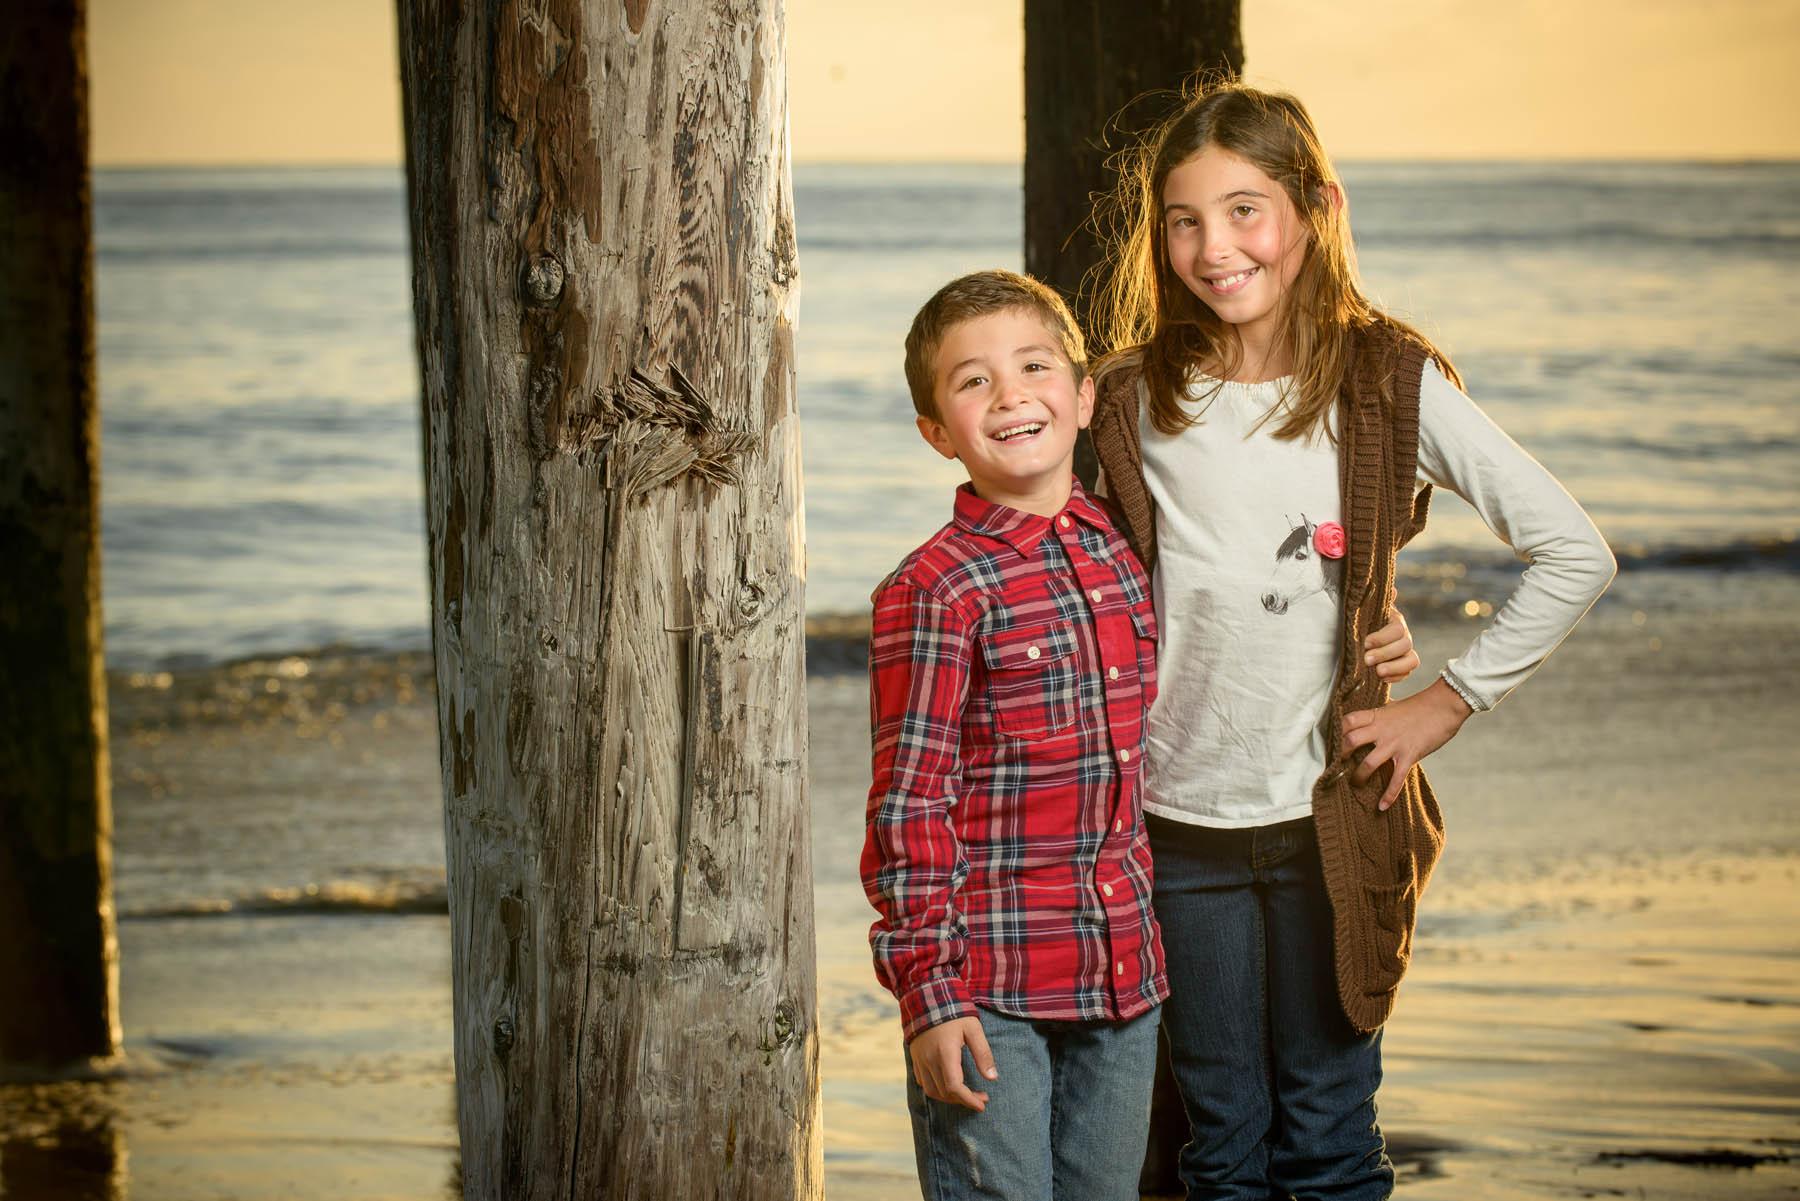 6028_d800_Muccilli_Capitola_Beach_Family_Photography.jpg